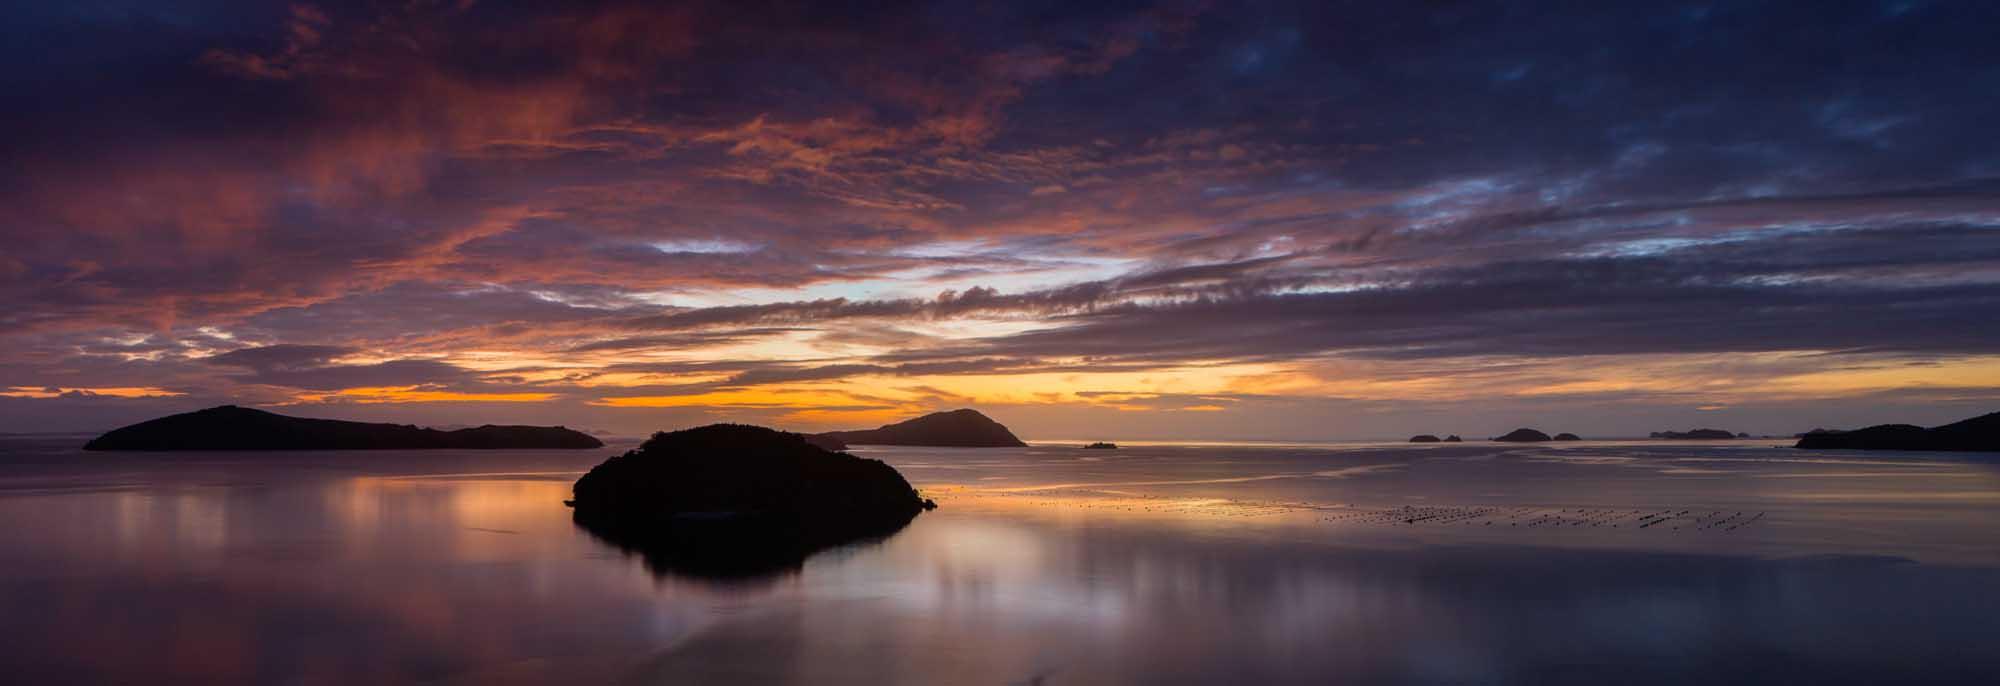 Coromandel Sunset 2.jpg